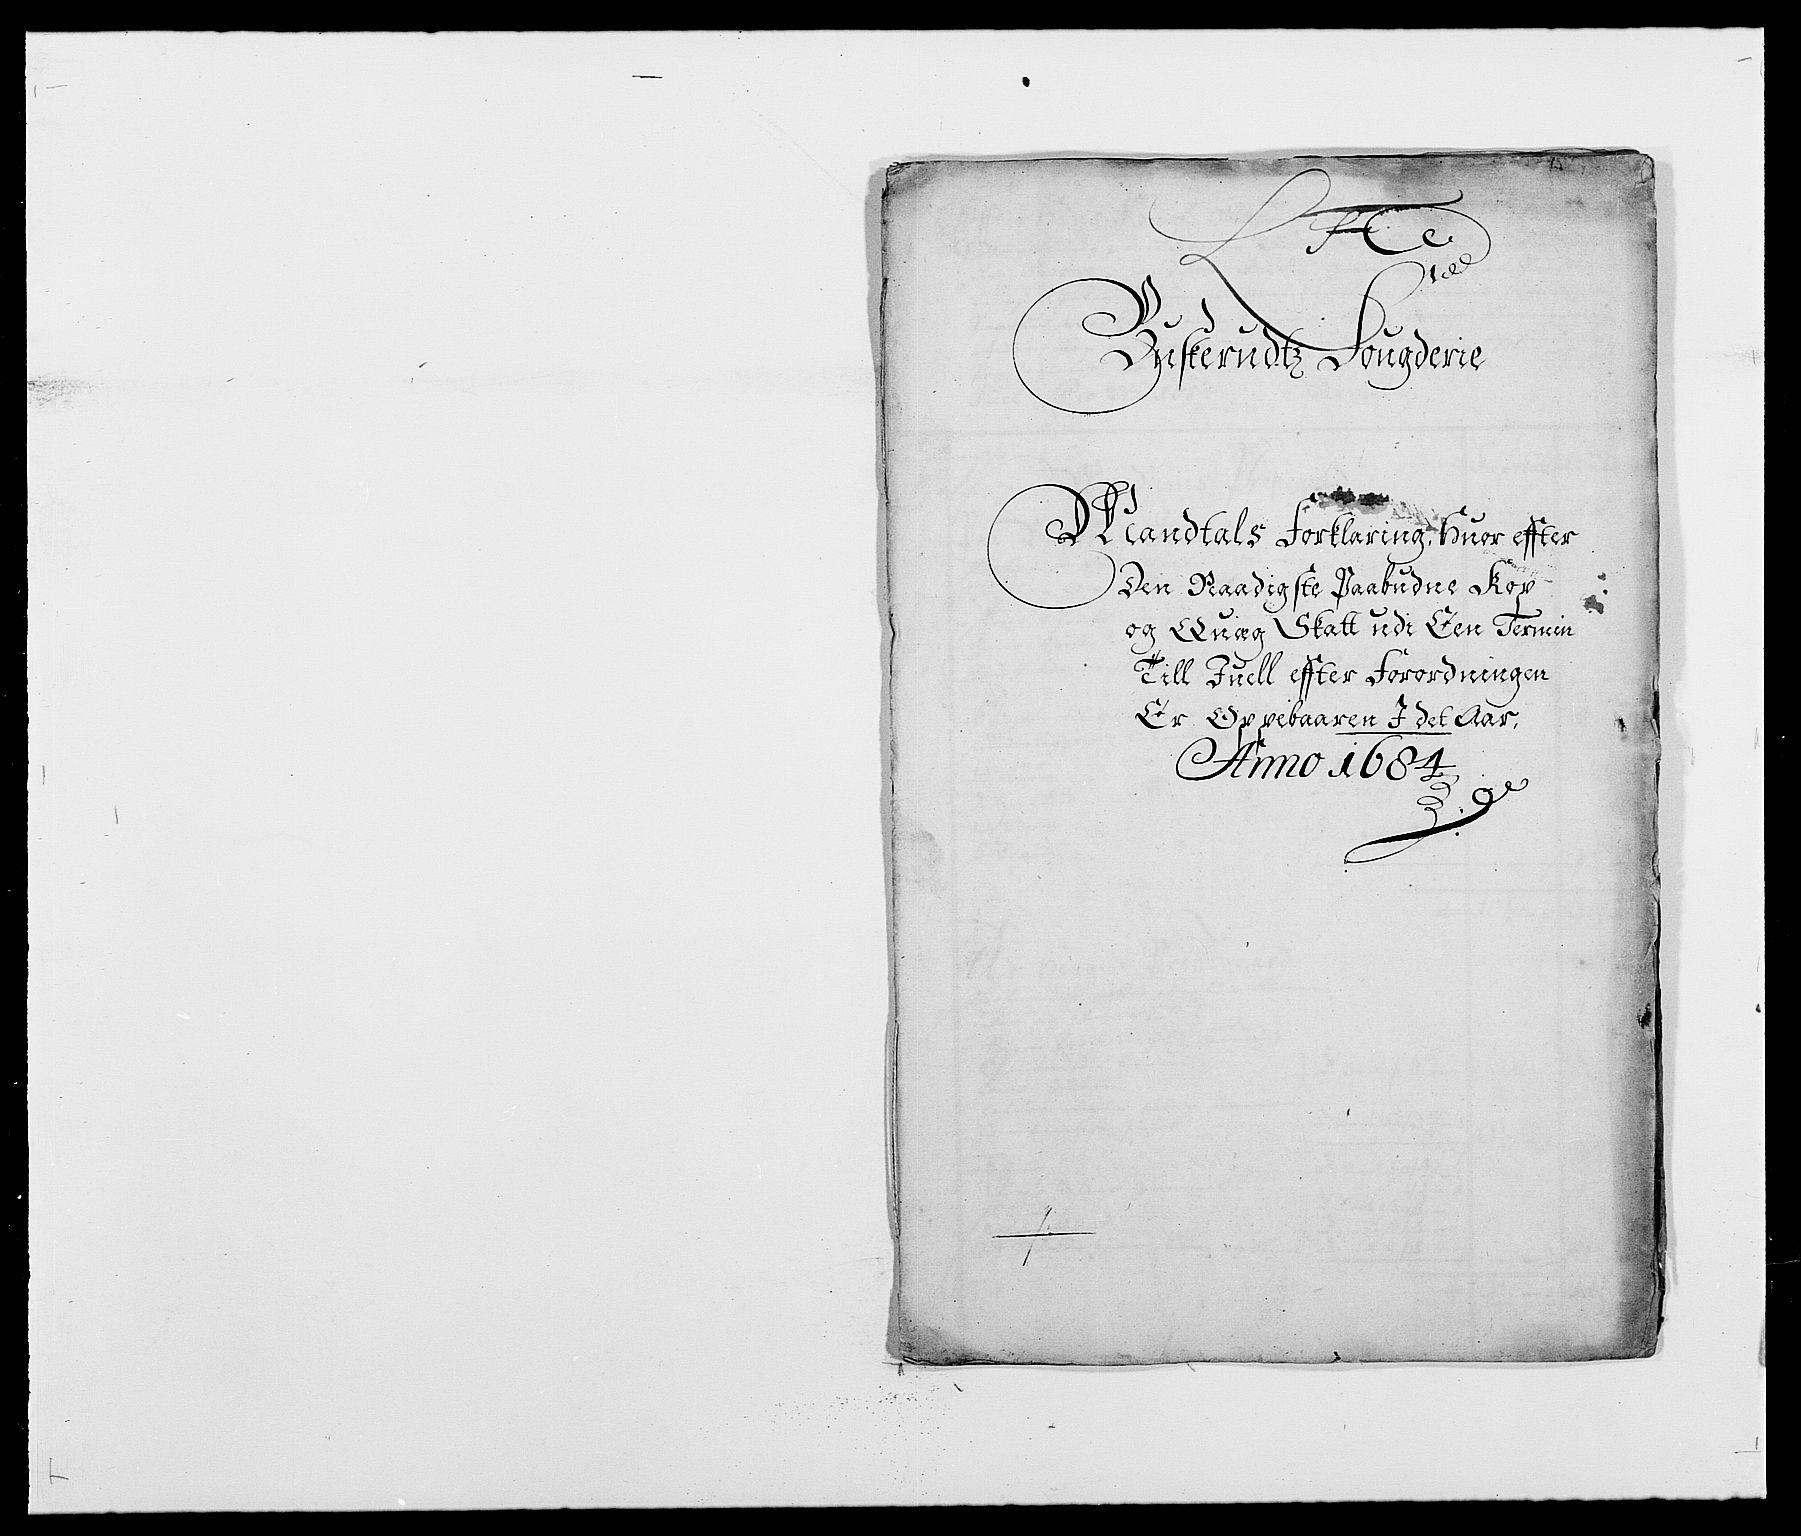 RA, Rentekammeret inntil 1814, Reviderte regnskaper, Fogderegnskap, R25/L1677: Fogderegnskap Buskerud, 1683-1684, s. 324